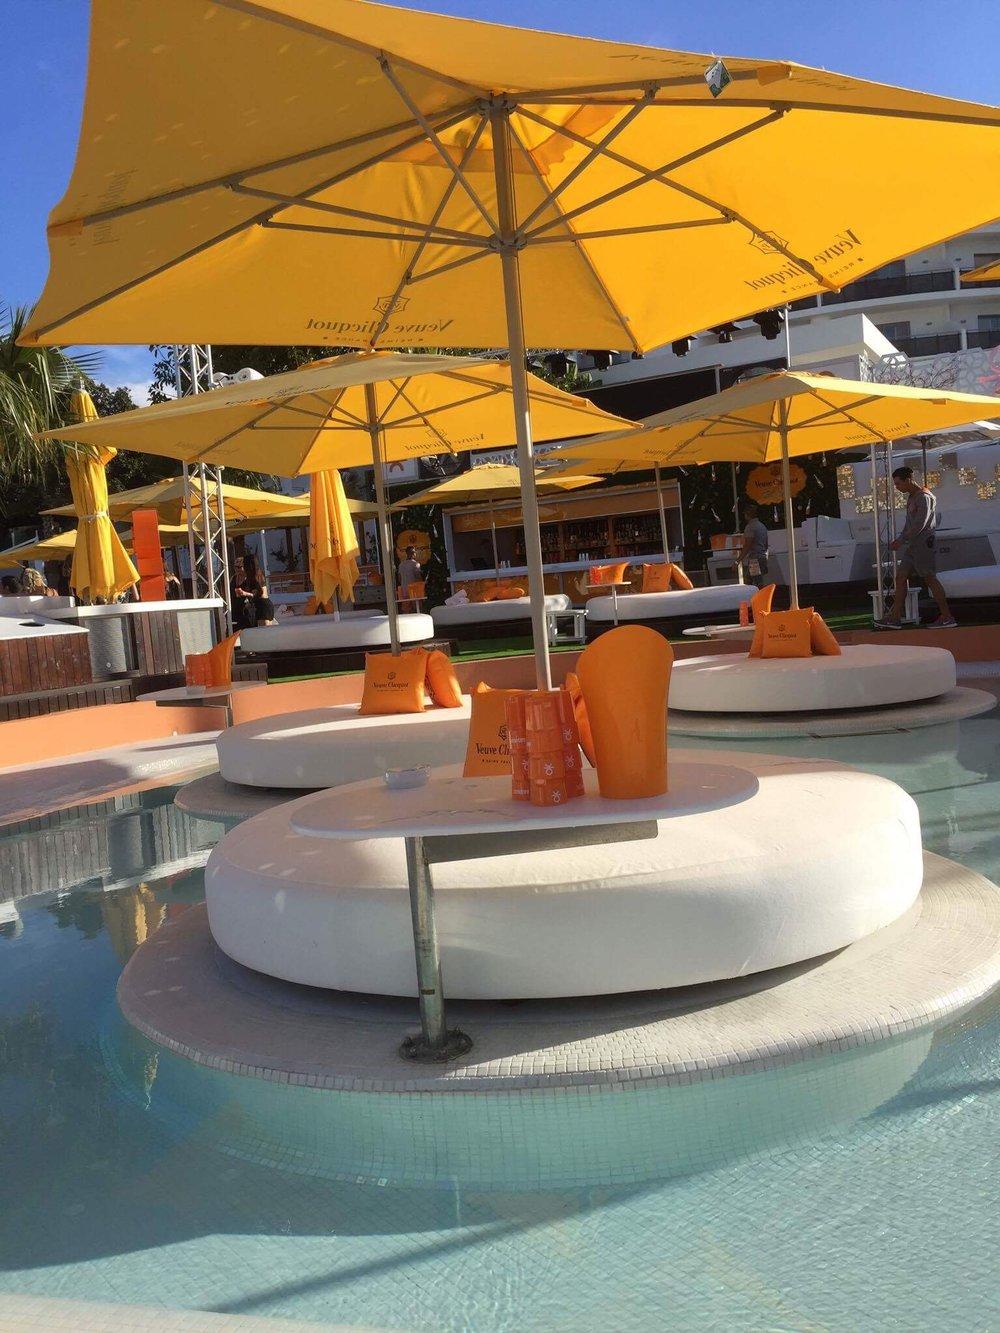 ocean_beach_club_ibiza_the_ultimate_ibiza_weekender_hen_party_veuve_clicquot_elle_blonde_luxury_lifestyle_blog